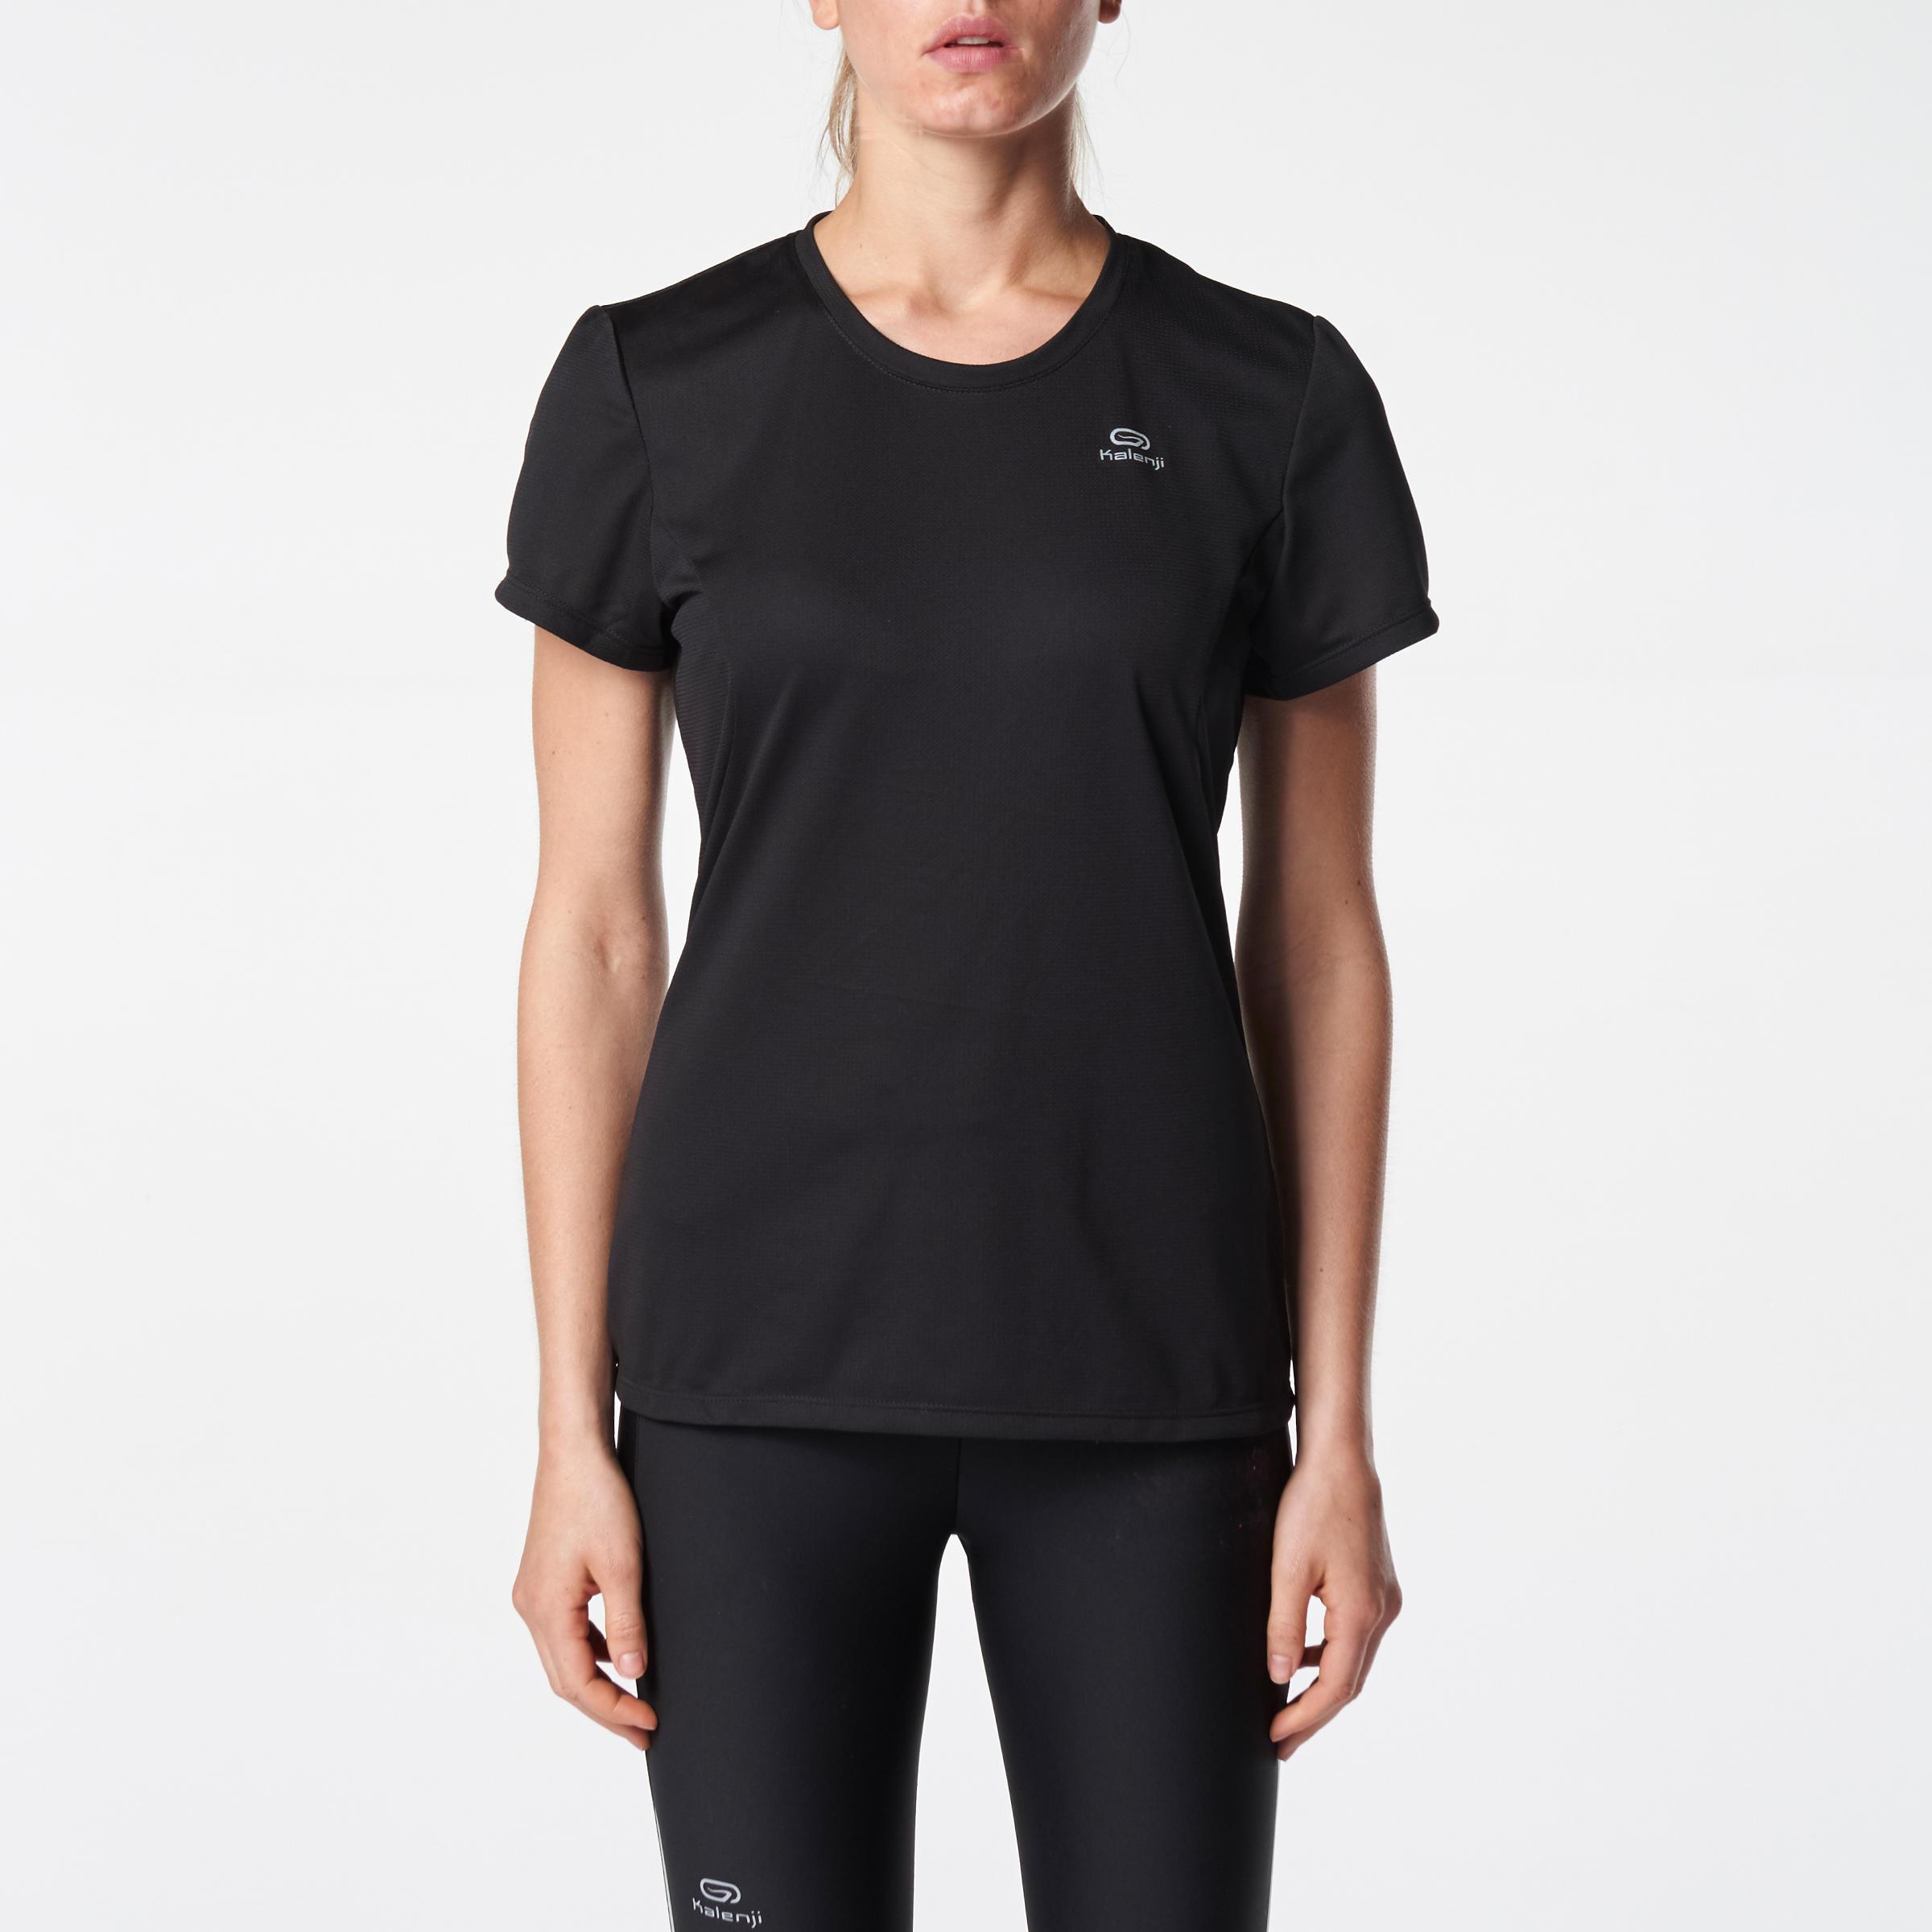 RUN DRY WOMEN'S JOGGING T-SHIRT - BLACK